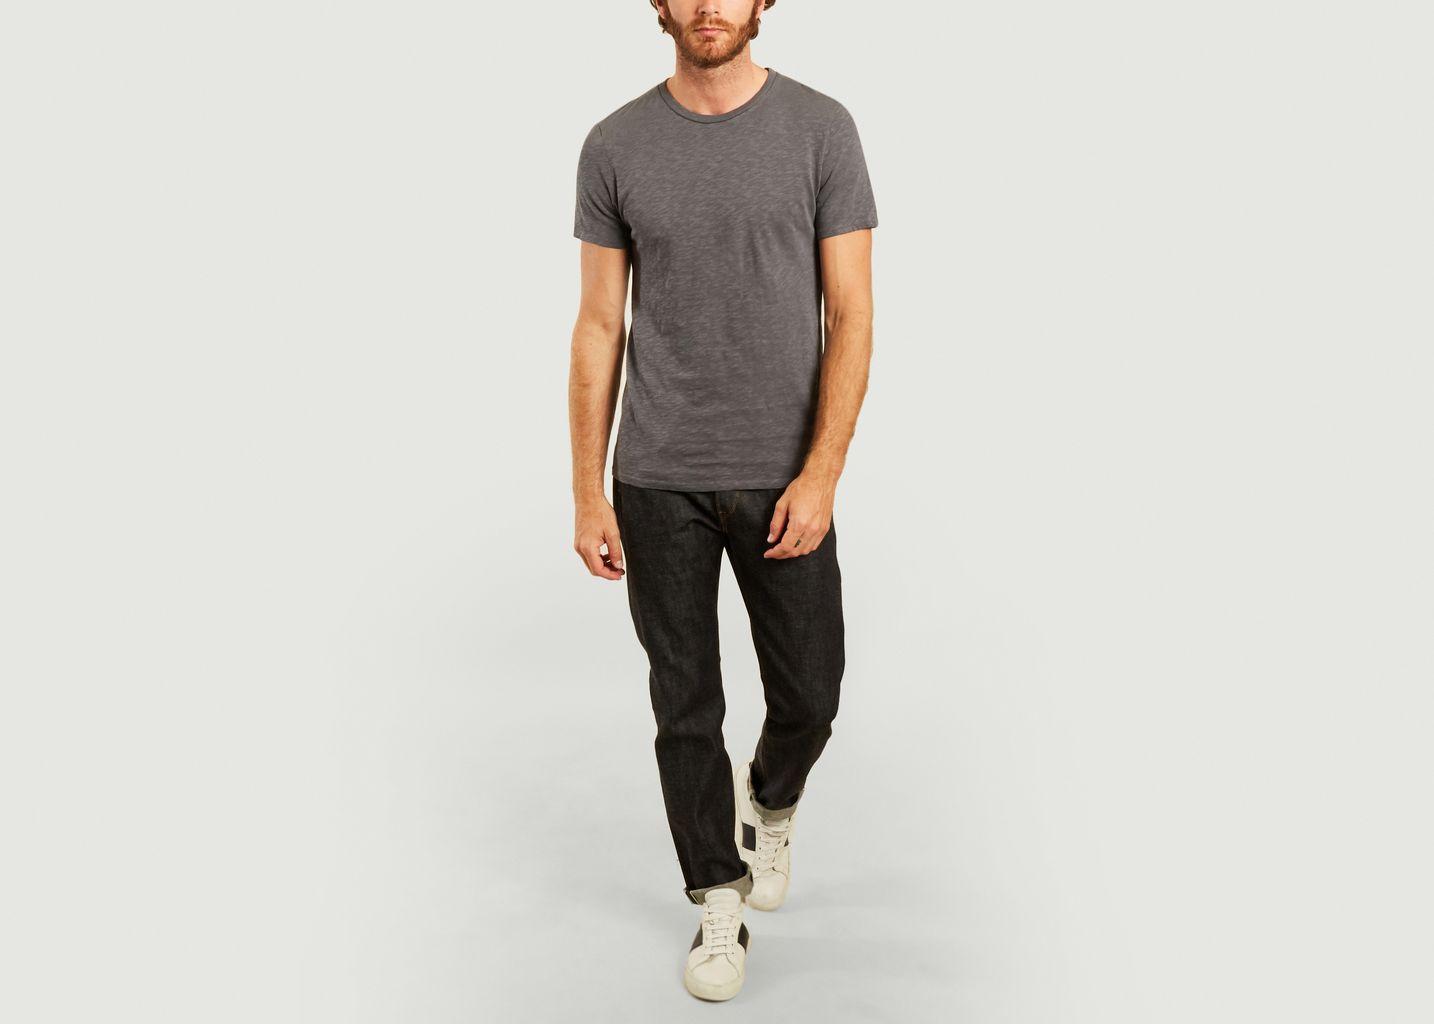 T-shirt en coton Bysapick - American Vintage